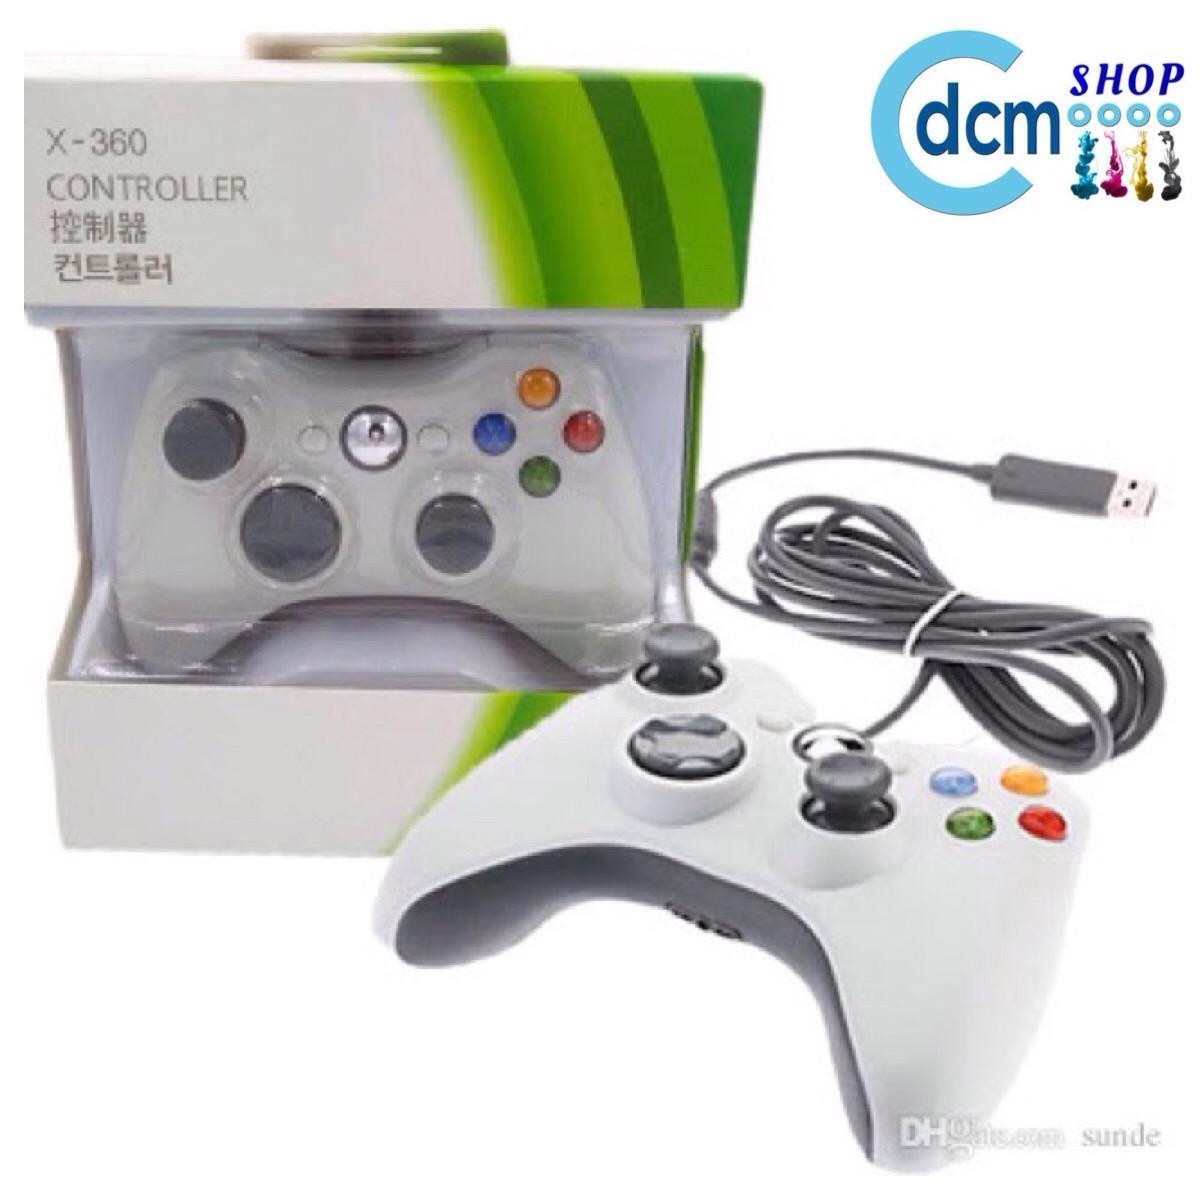 Xbox Philippines: Xbox price list - Xbox Controller & Video Games ...